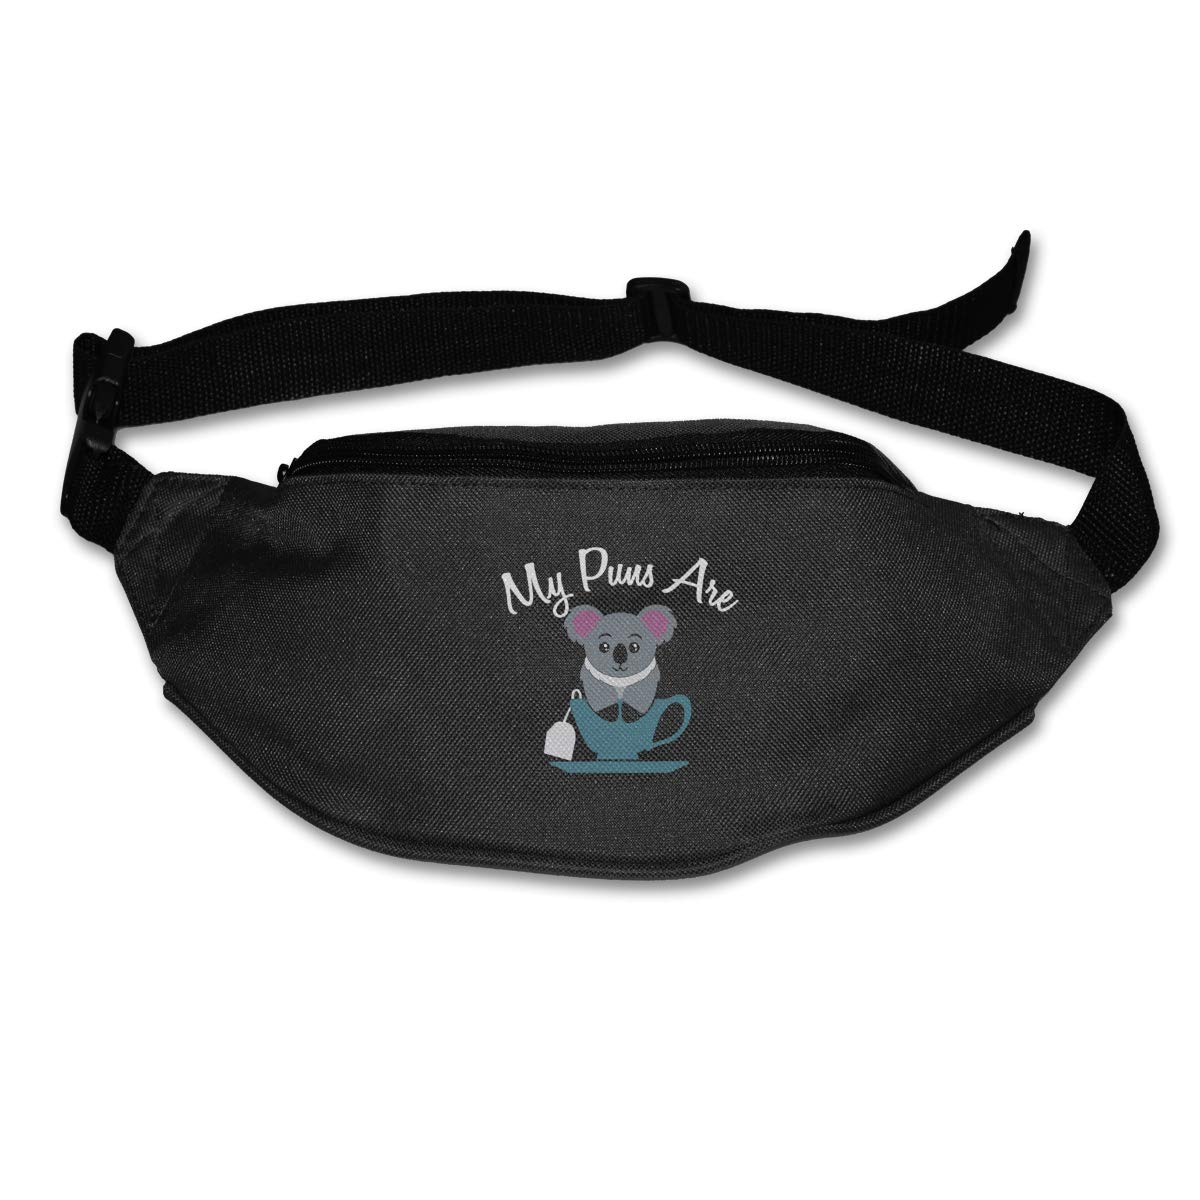 My Puns Are Koala Sport Waist Packs Fanny Pack Adjustable For Travel